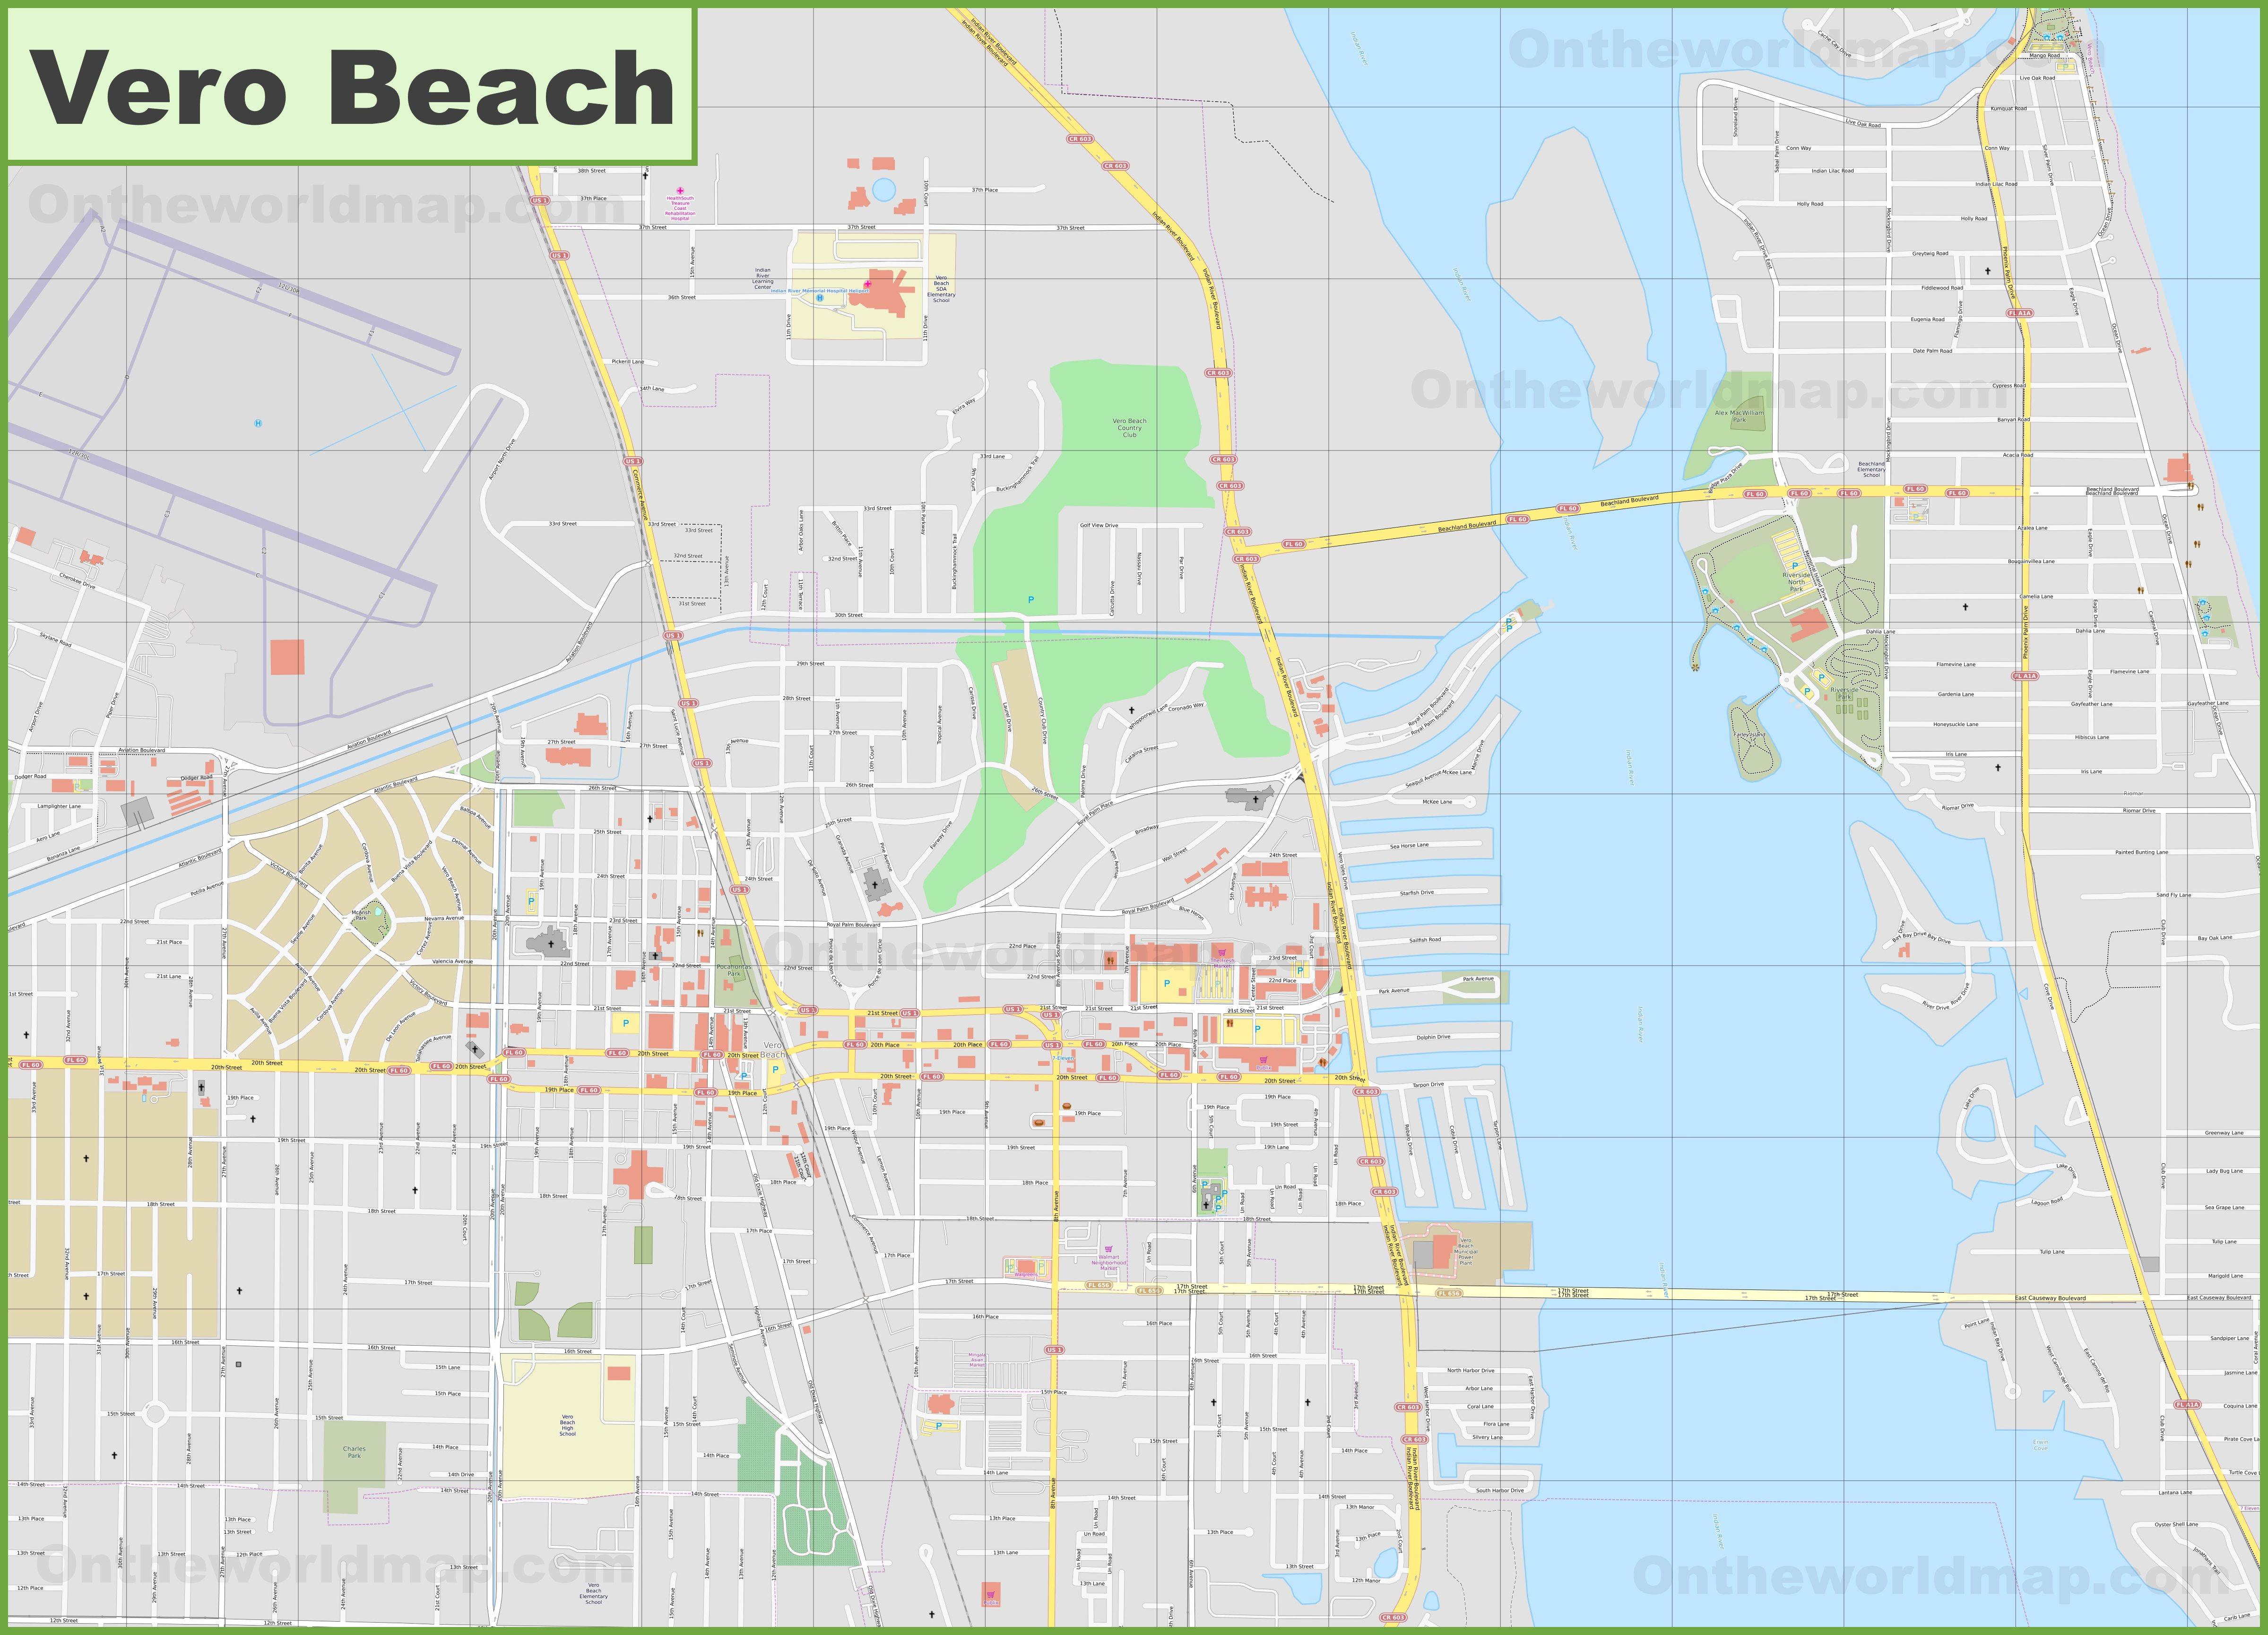 Large Detailed Map Of Vero Beach - Google Maps Vero Beach Florida